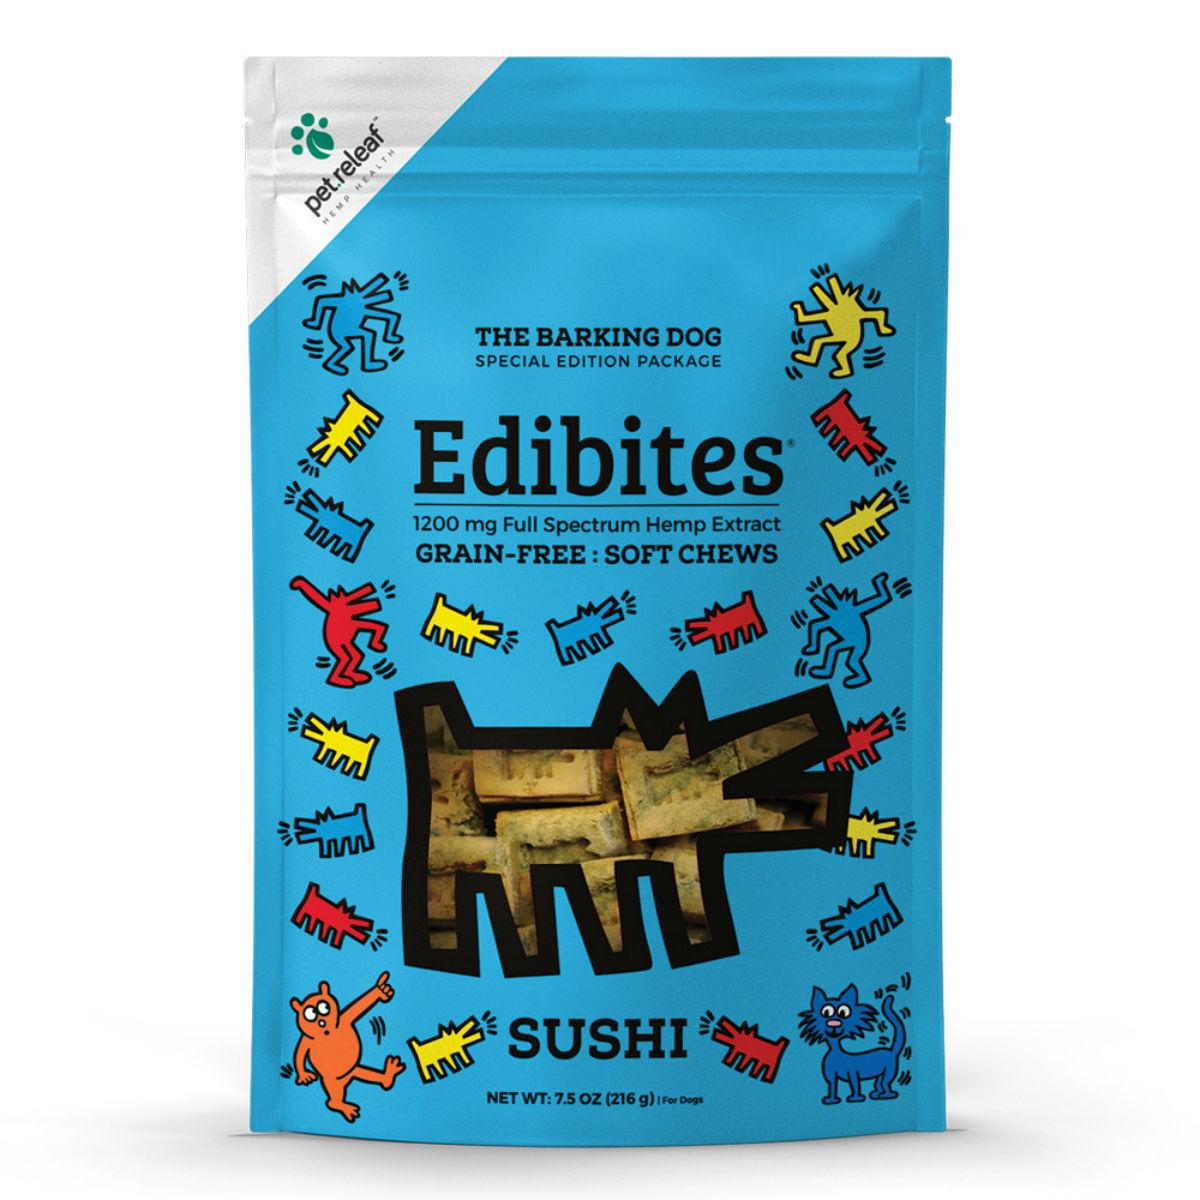 Pet Releaf Barking Dog Edibites Soft Chew Dog Treats - Sushi_main